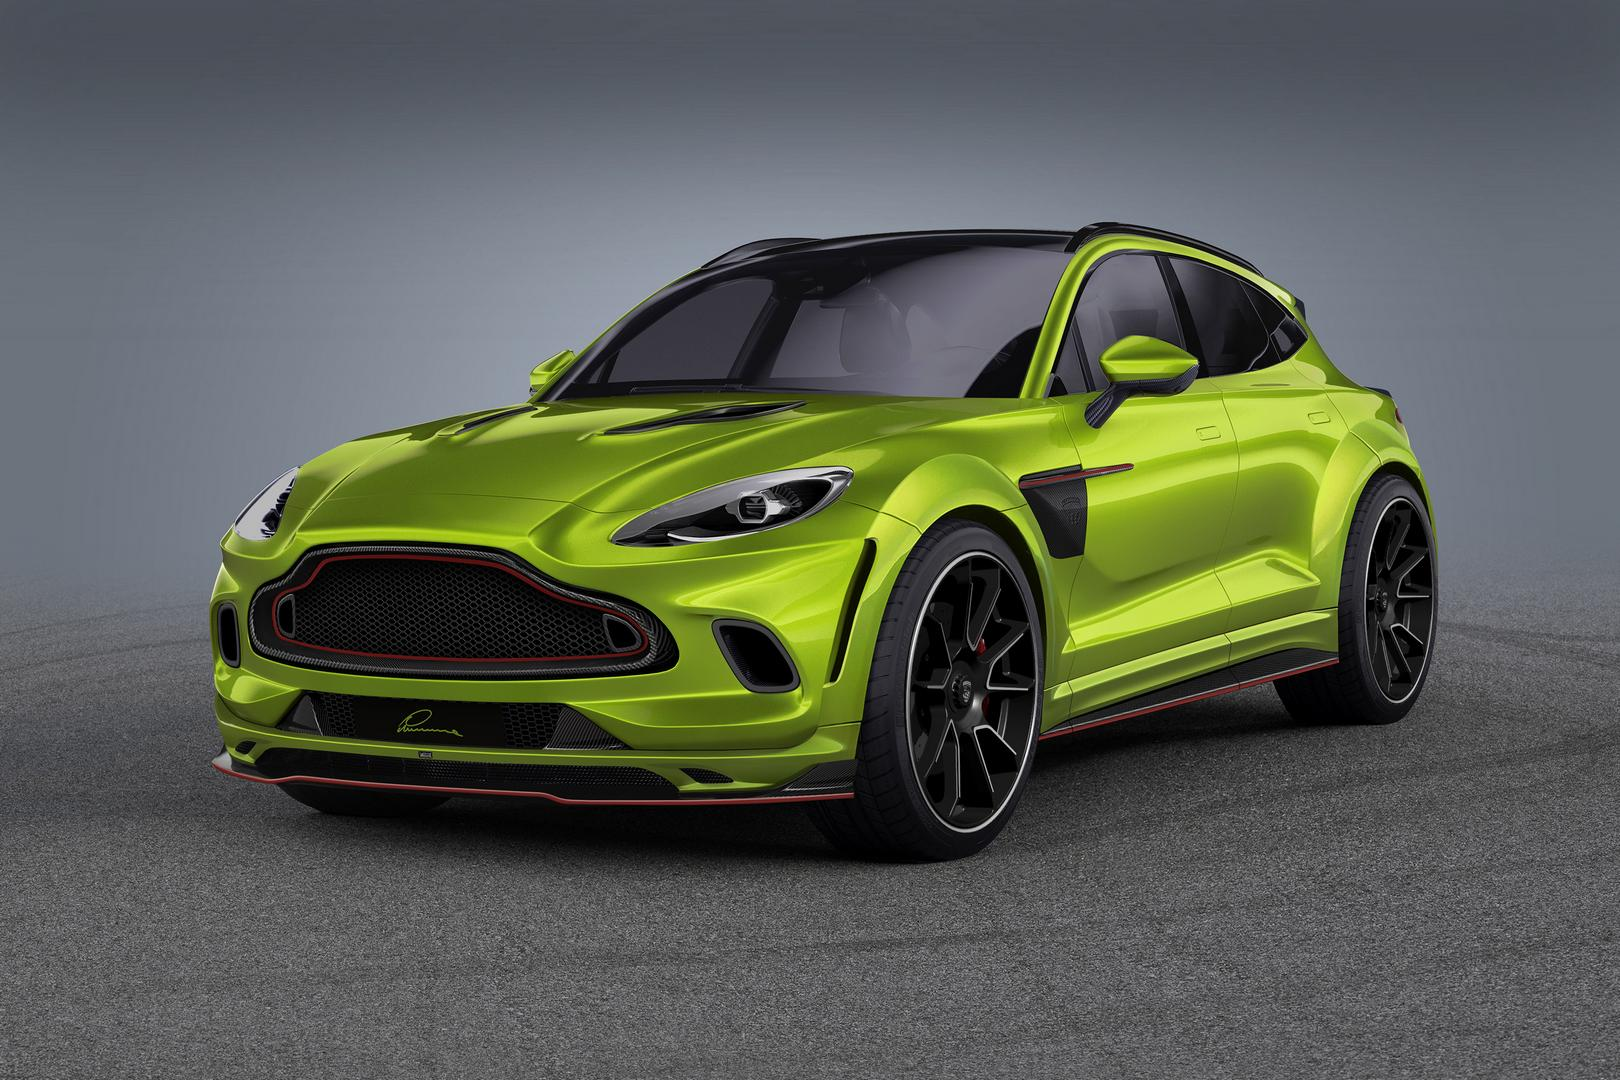 Green Aston Martin DBX